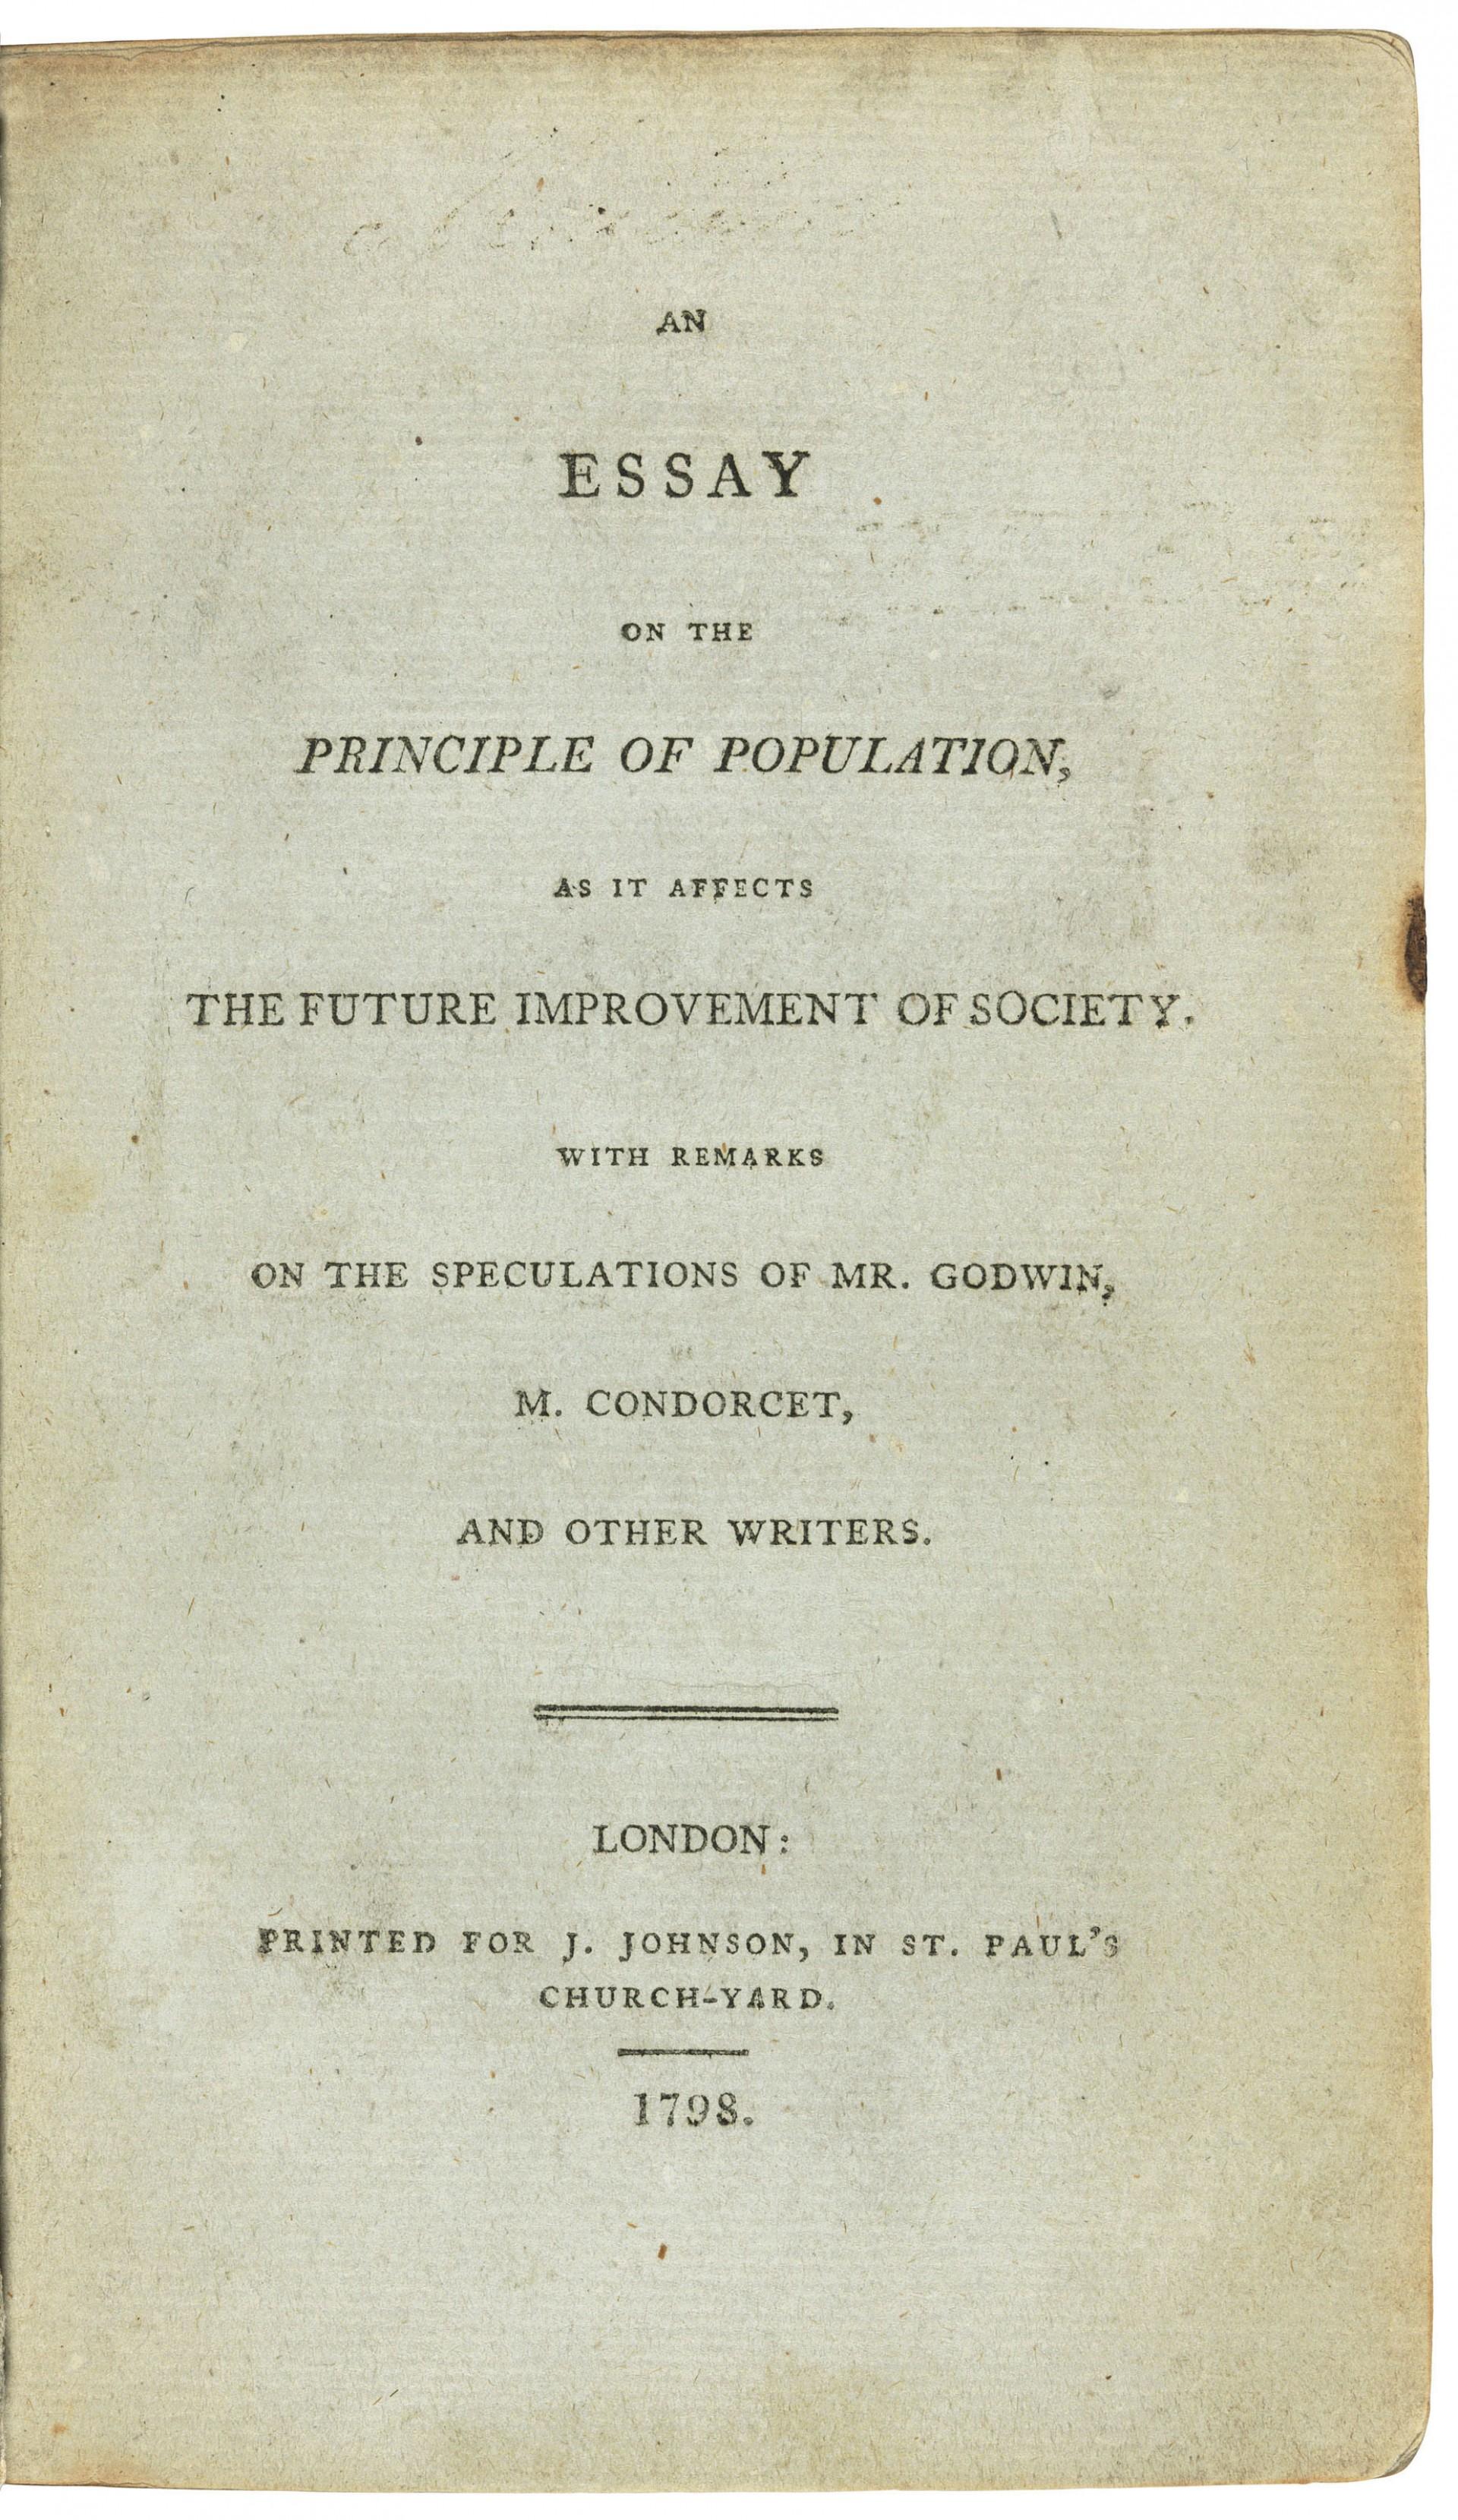 013 2018 Cks 16018 0261 000malthus Thomas Robert An Essay On The Principle Of As It Af Example Singular Population Pdf By Malthus Main Idea 1920